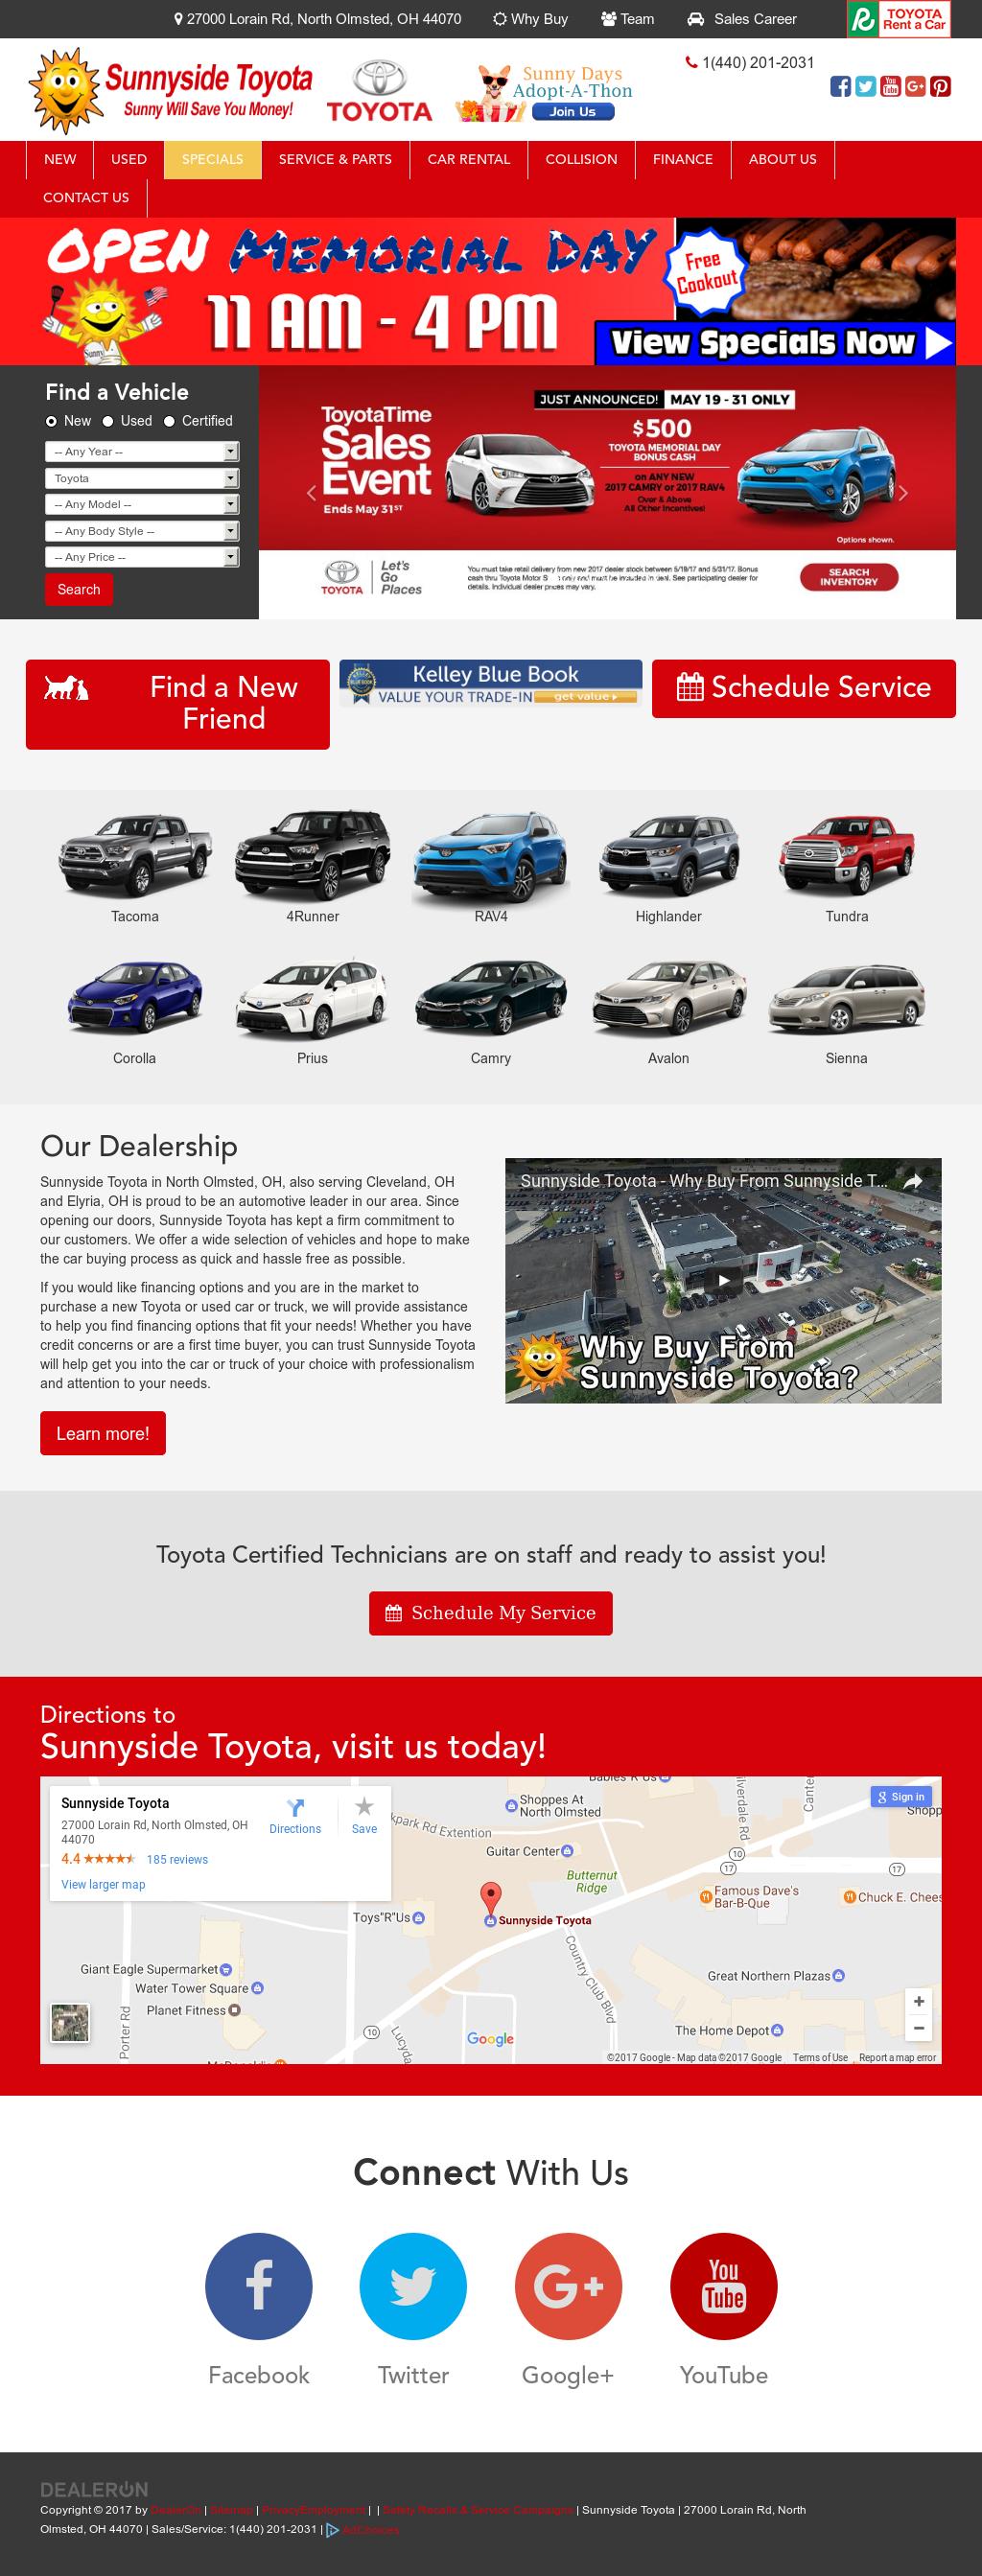 Sunnyside Toyotau0027s Website Screenshot On May 2017